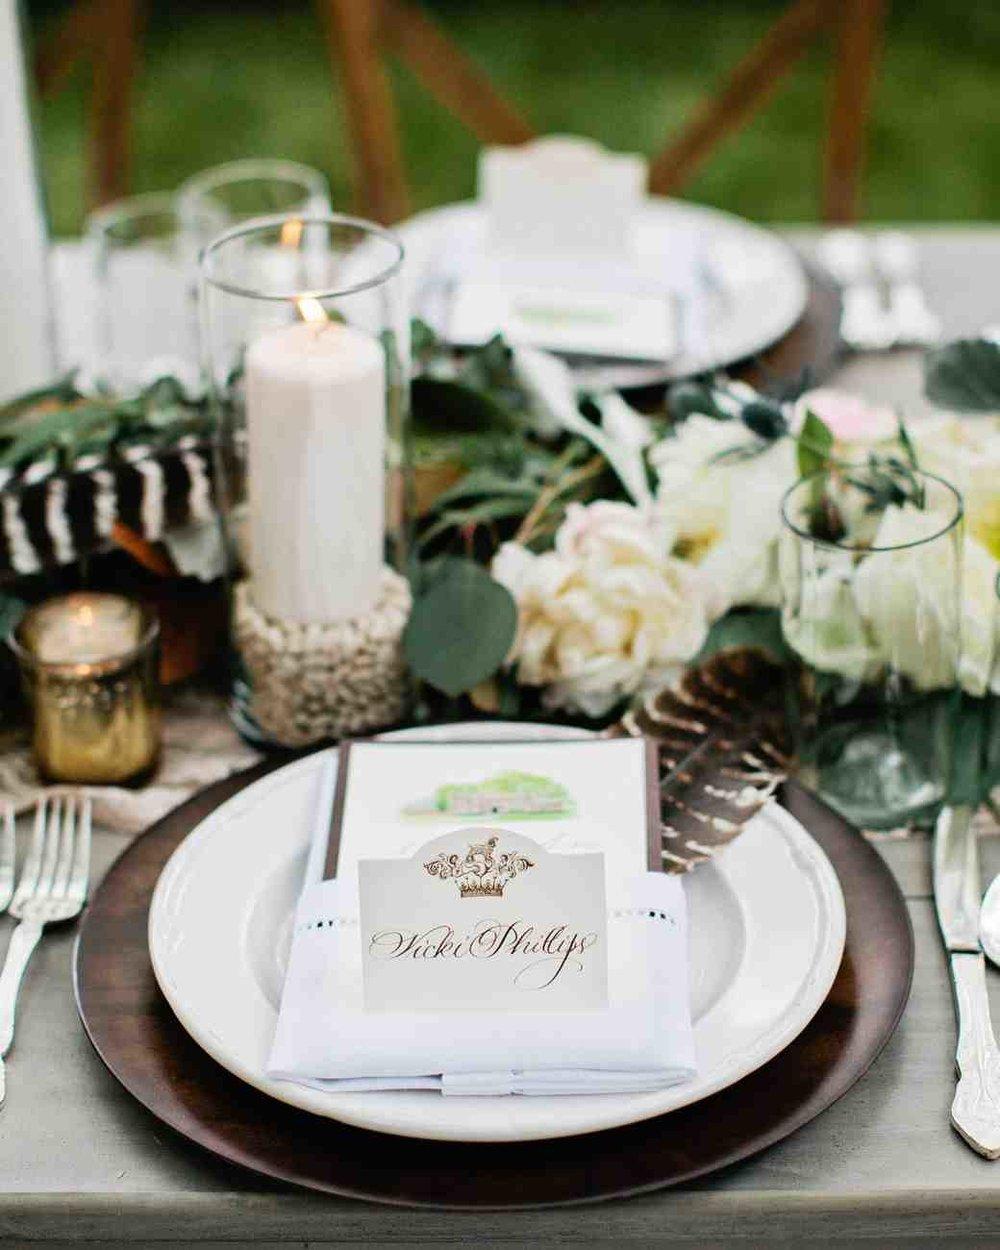 memree-rich-wedding-placesetting-693-6257086-0217_vert.jpg